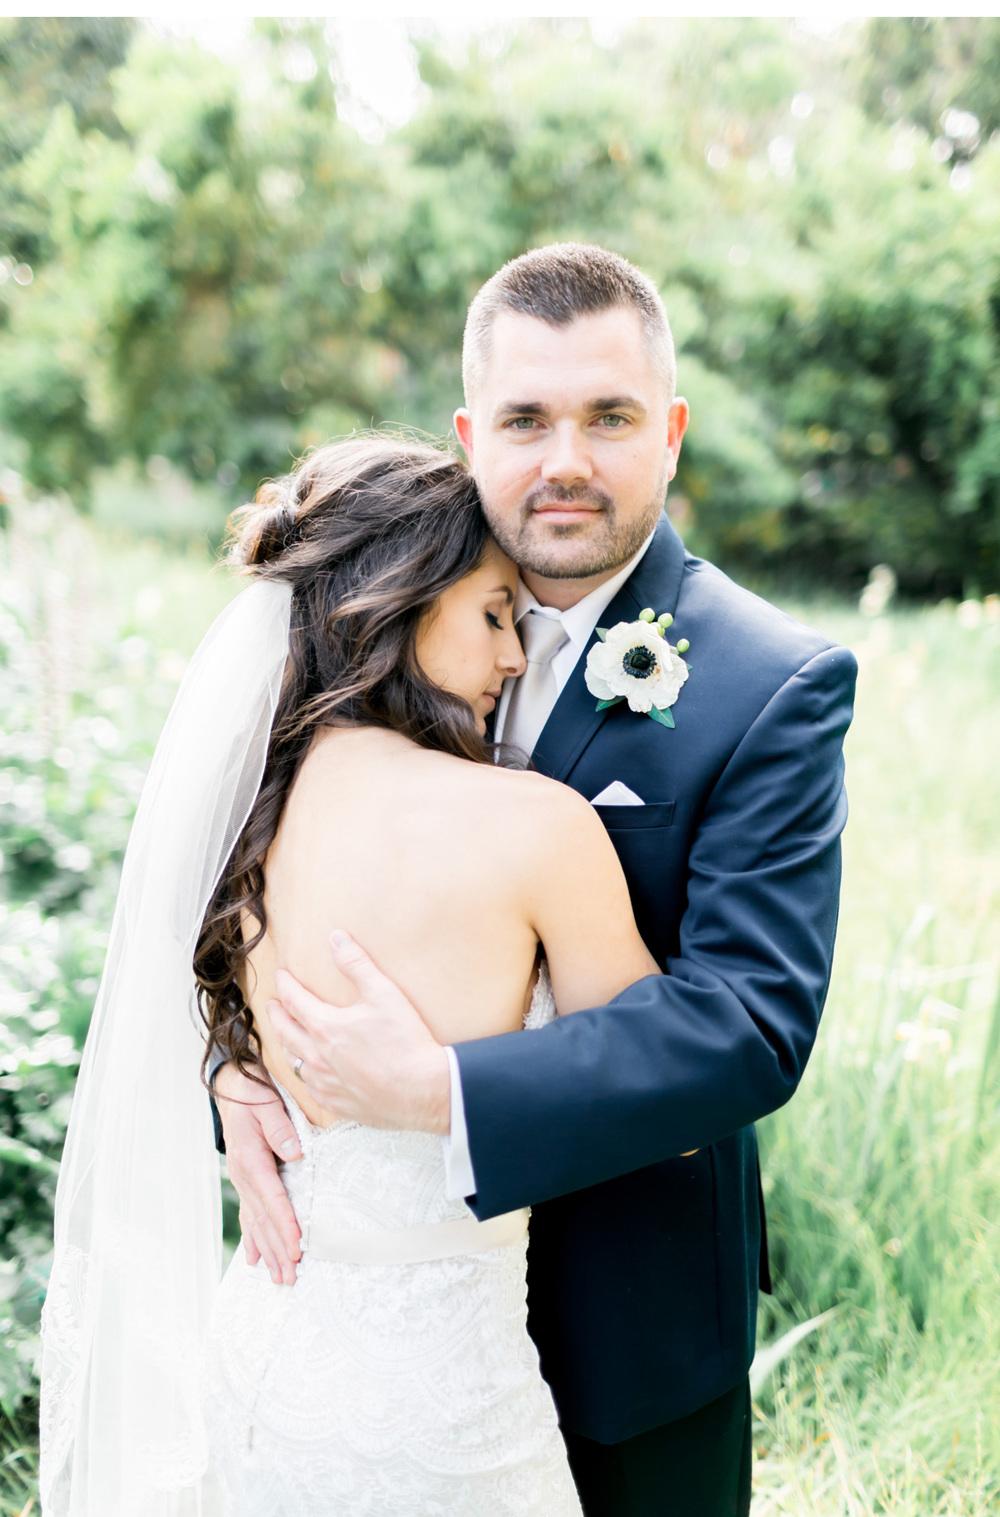 Adventure-Wedding-Photographer-Natalie-Schutt-Photography_08.jpg